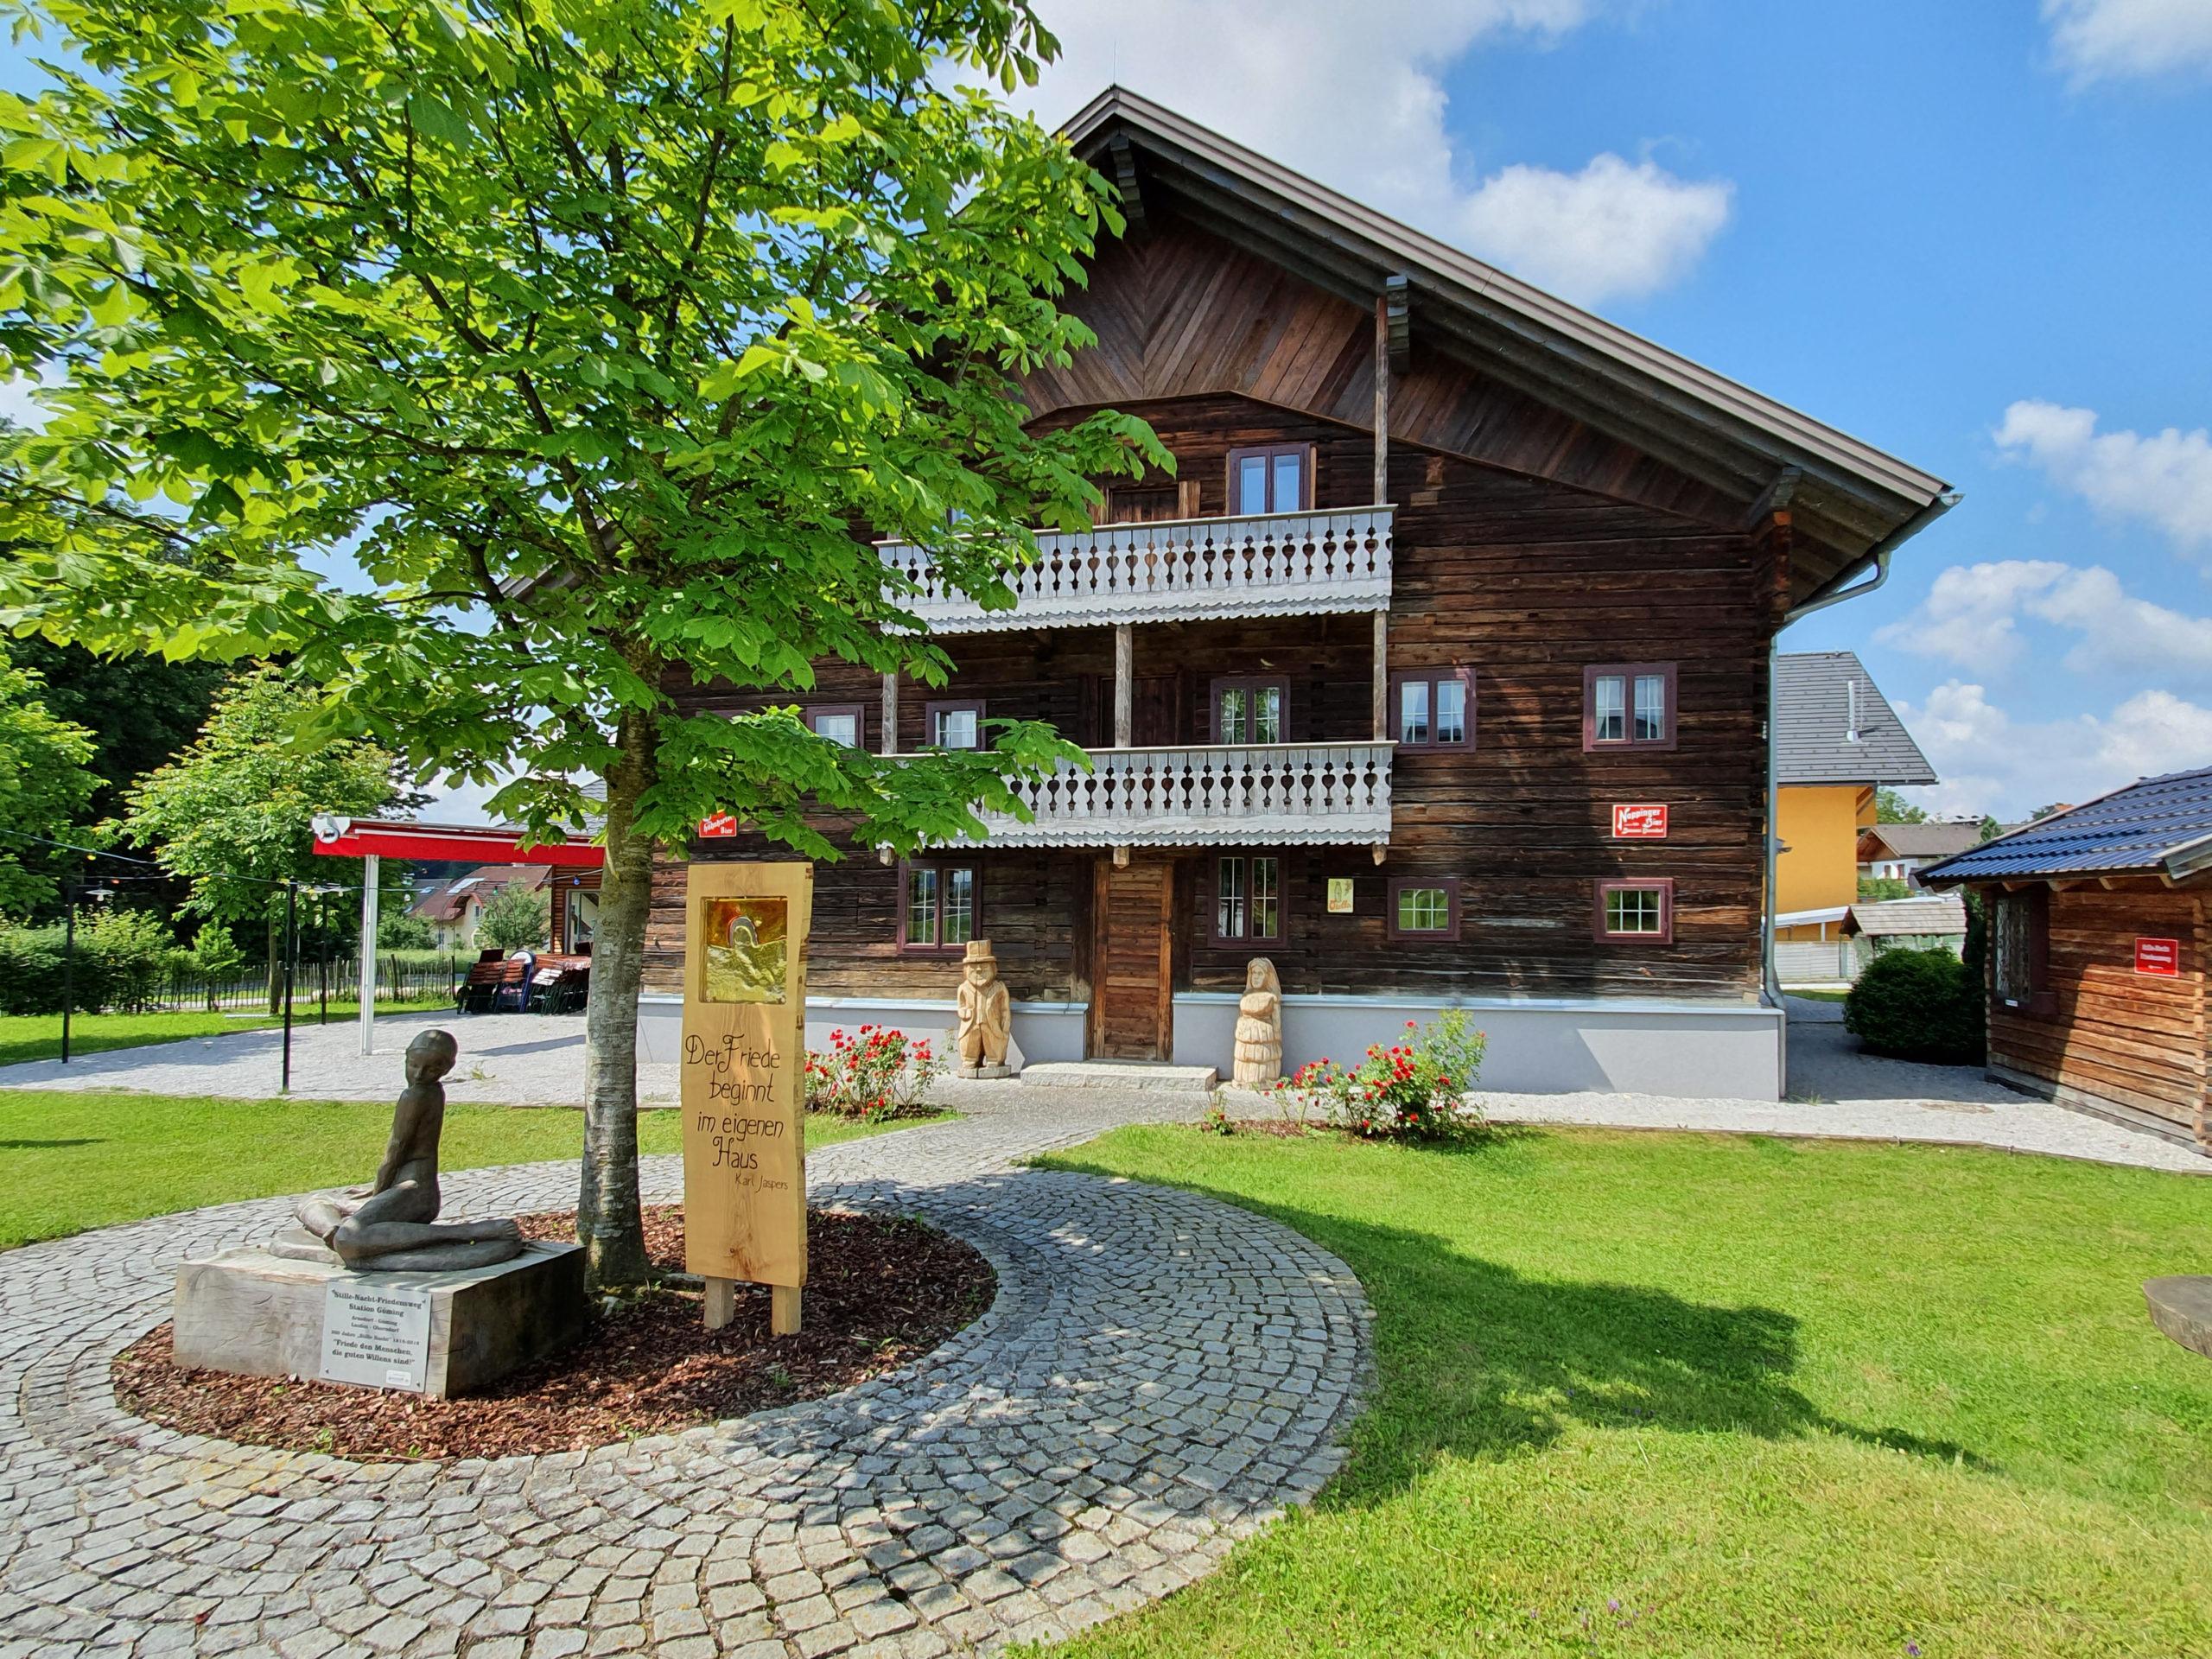 Hellbauerhaus © paodesign, Gemeinde Göming